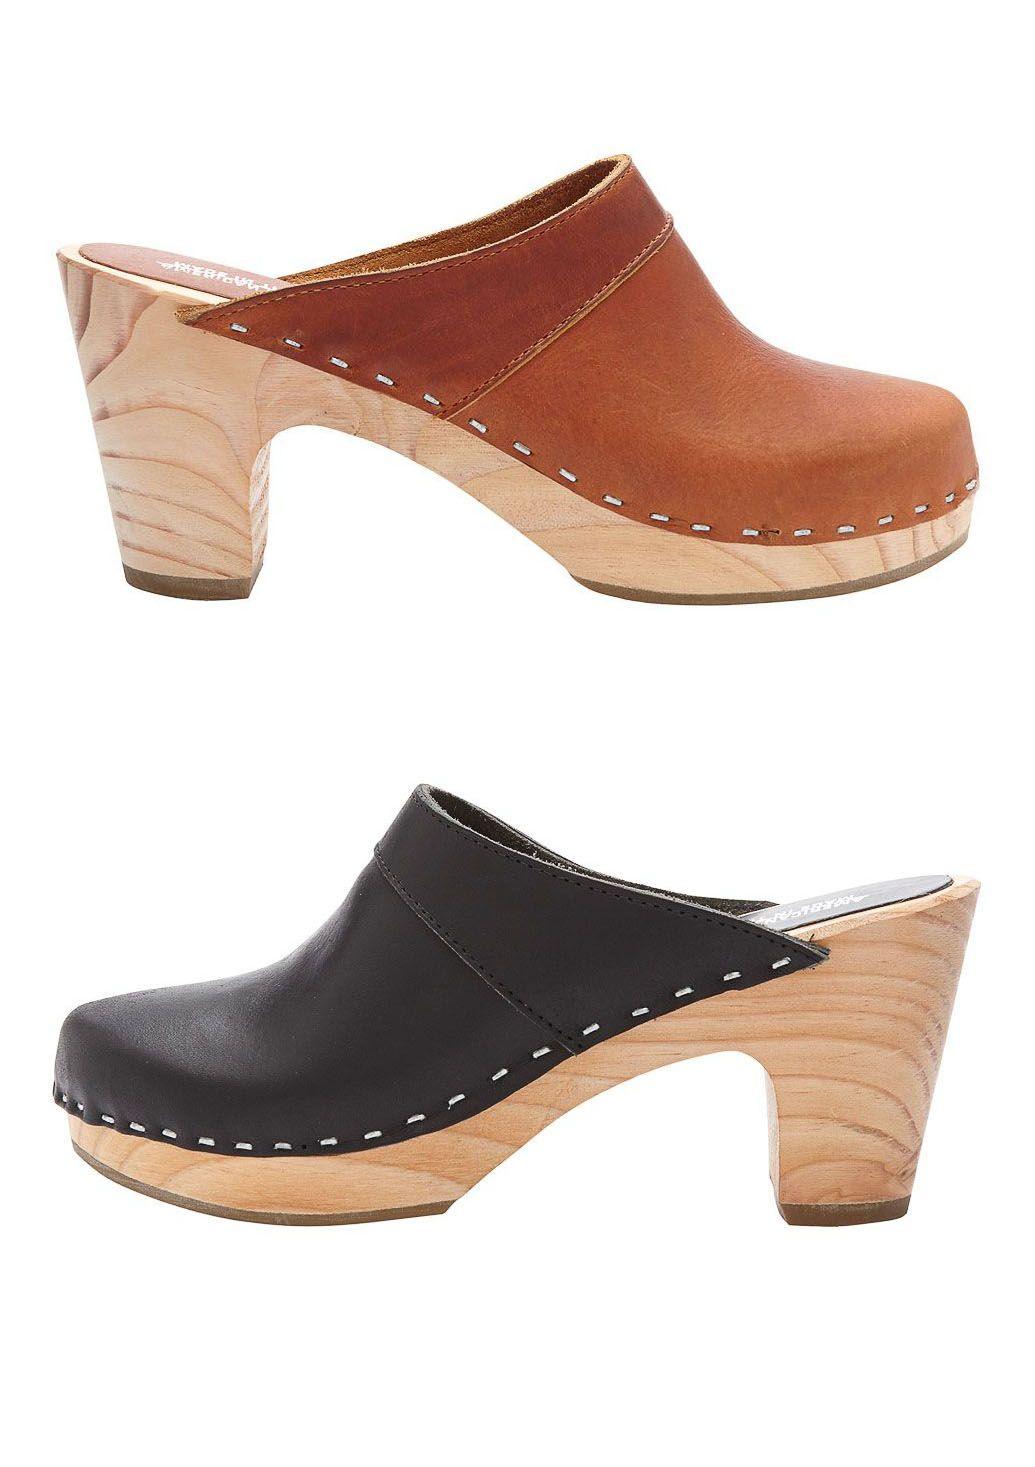 02b0bbfde81 Classic Clog by American Apparel.  clog  shoes  classic